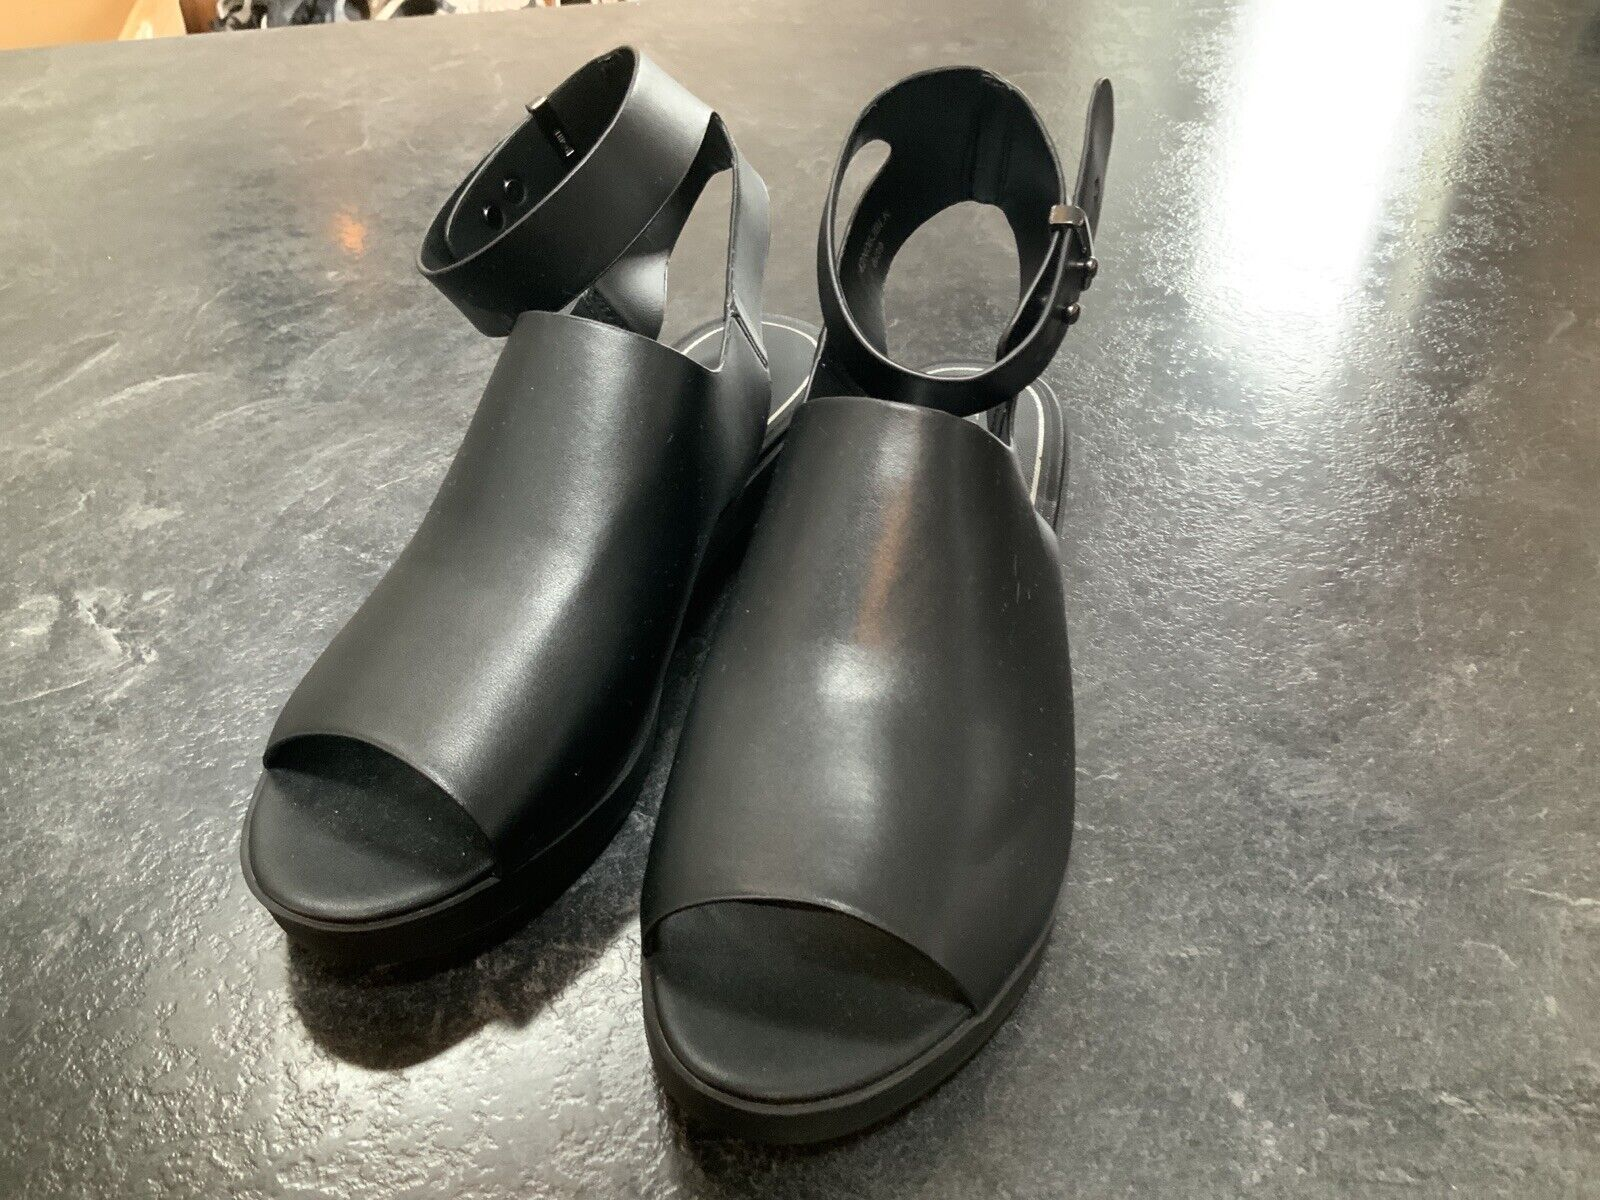 Topshop Open Toe Sling Backs Mid Chunky Heel NEW Black SIZE 6 RRP